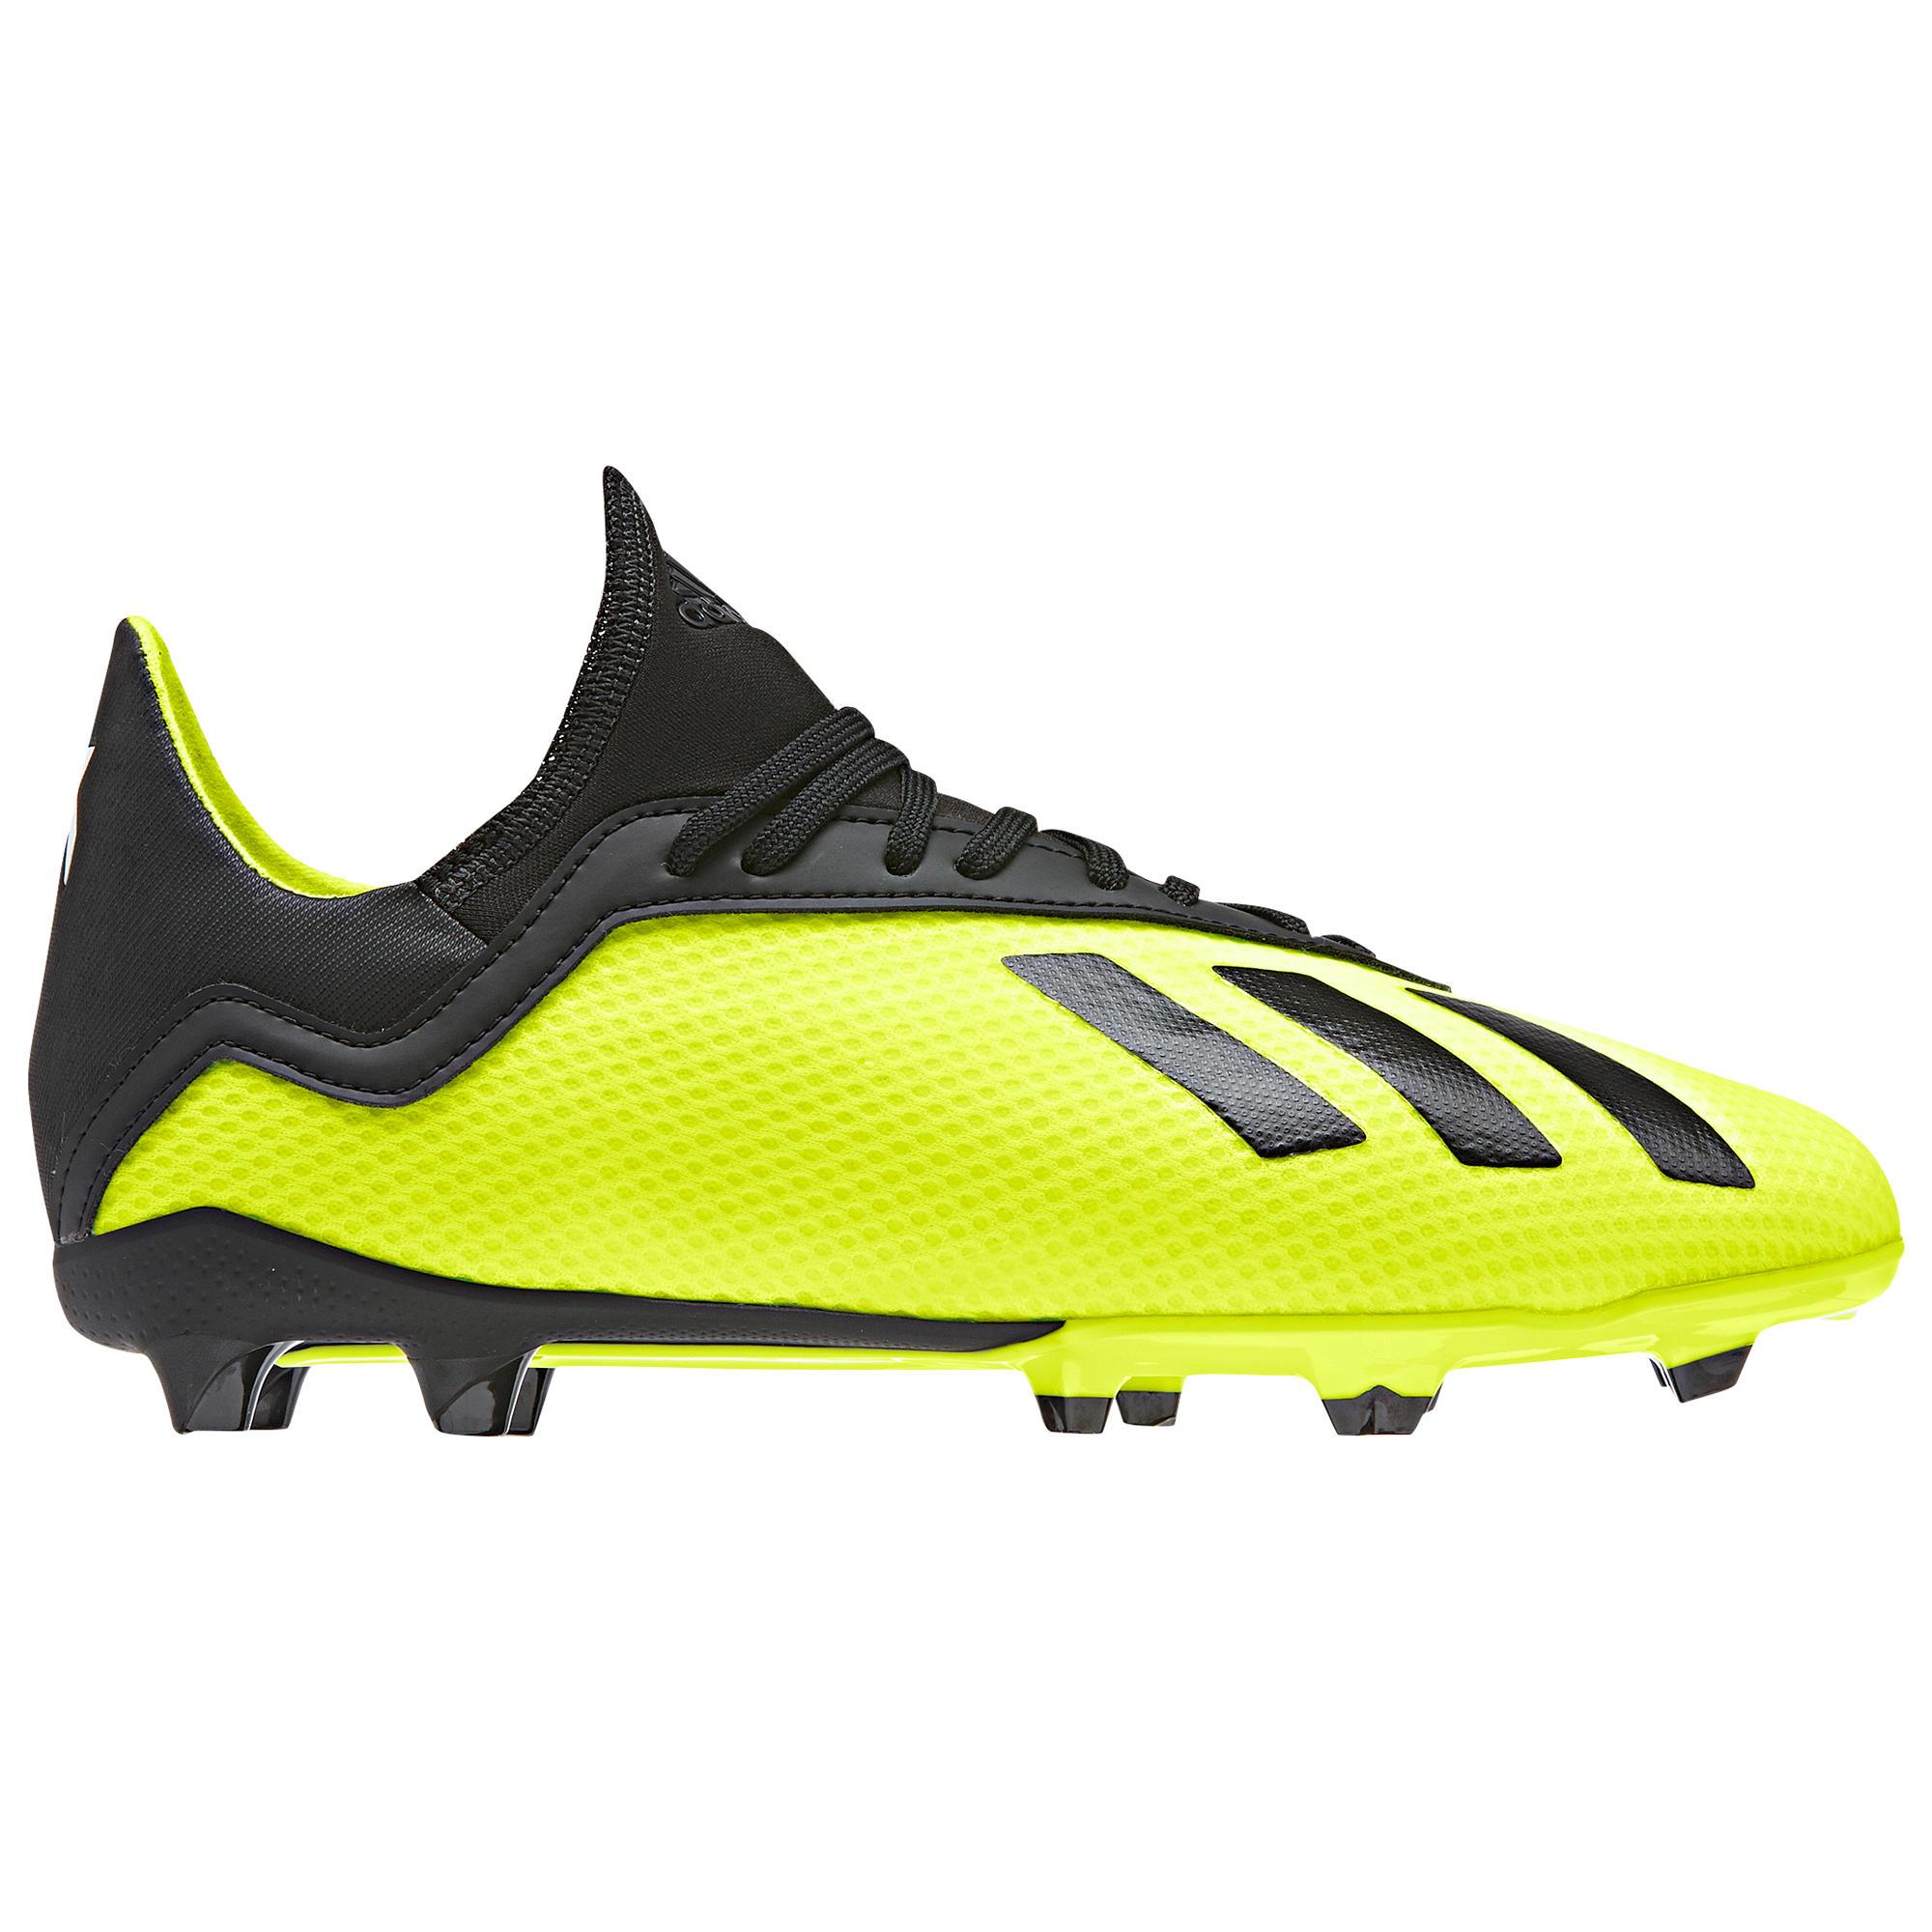 purchase cheap e827f 43234 Chaussures de football   Decathlon